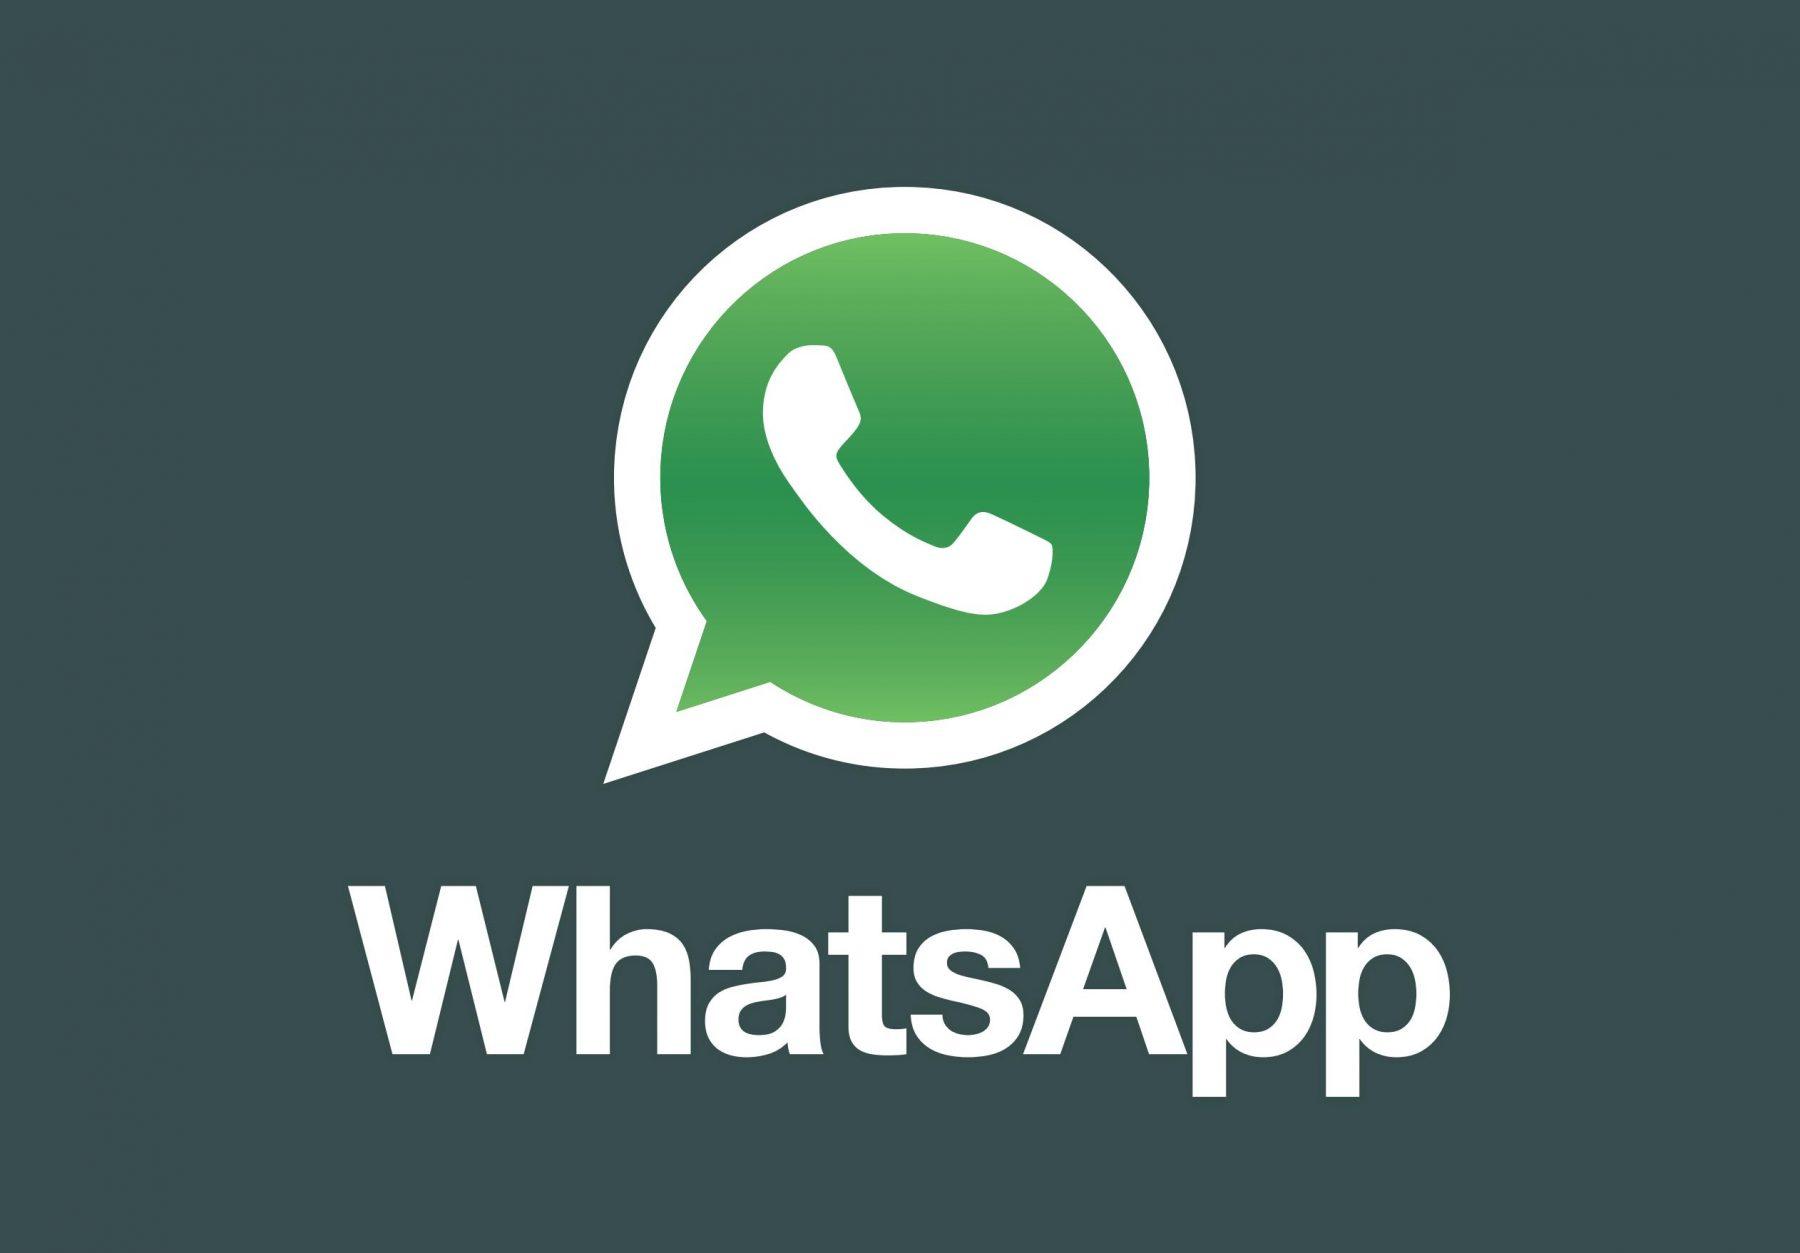 WhatsApp Messenger 2.16.233 Beta